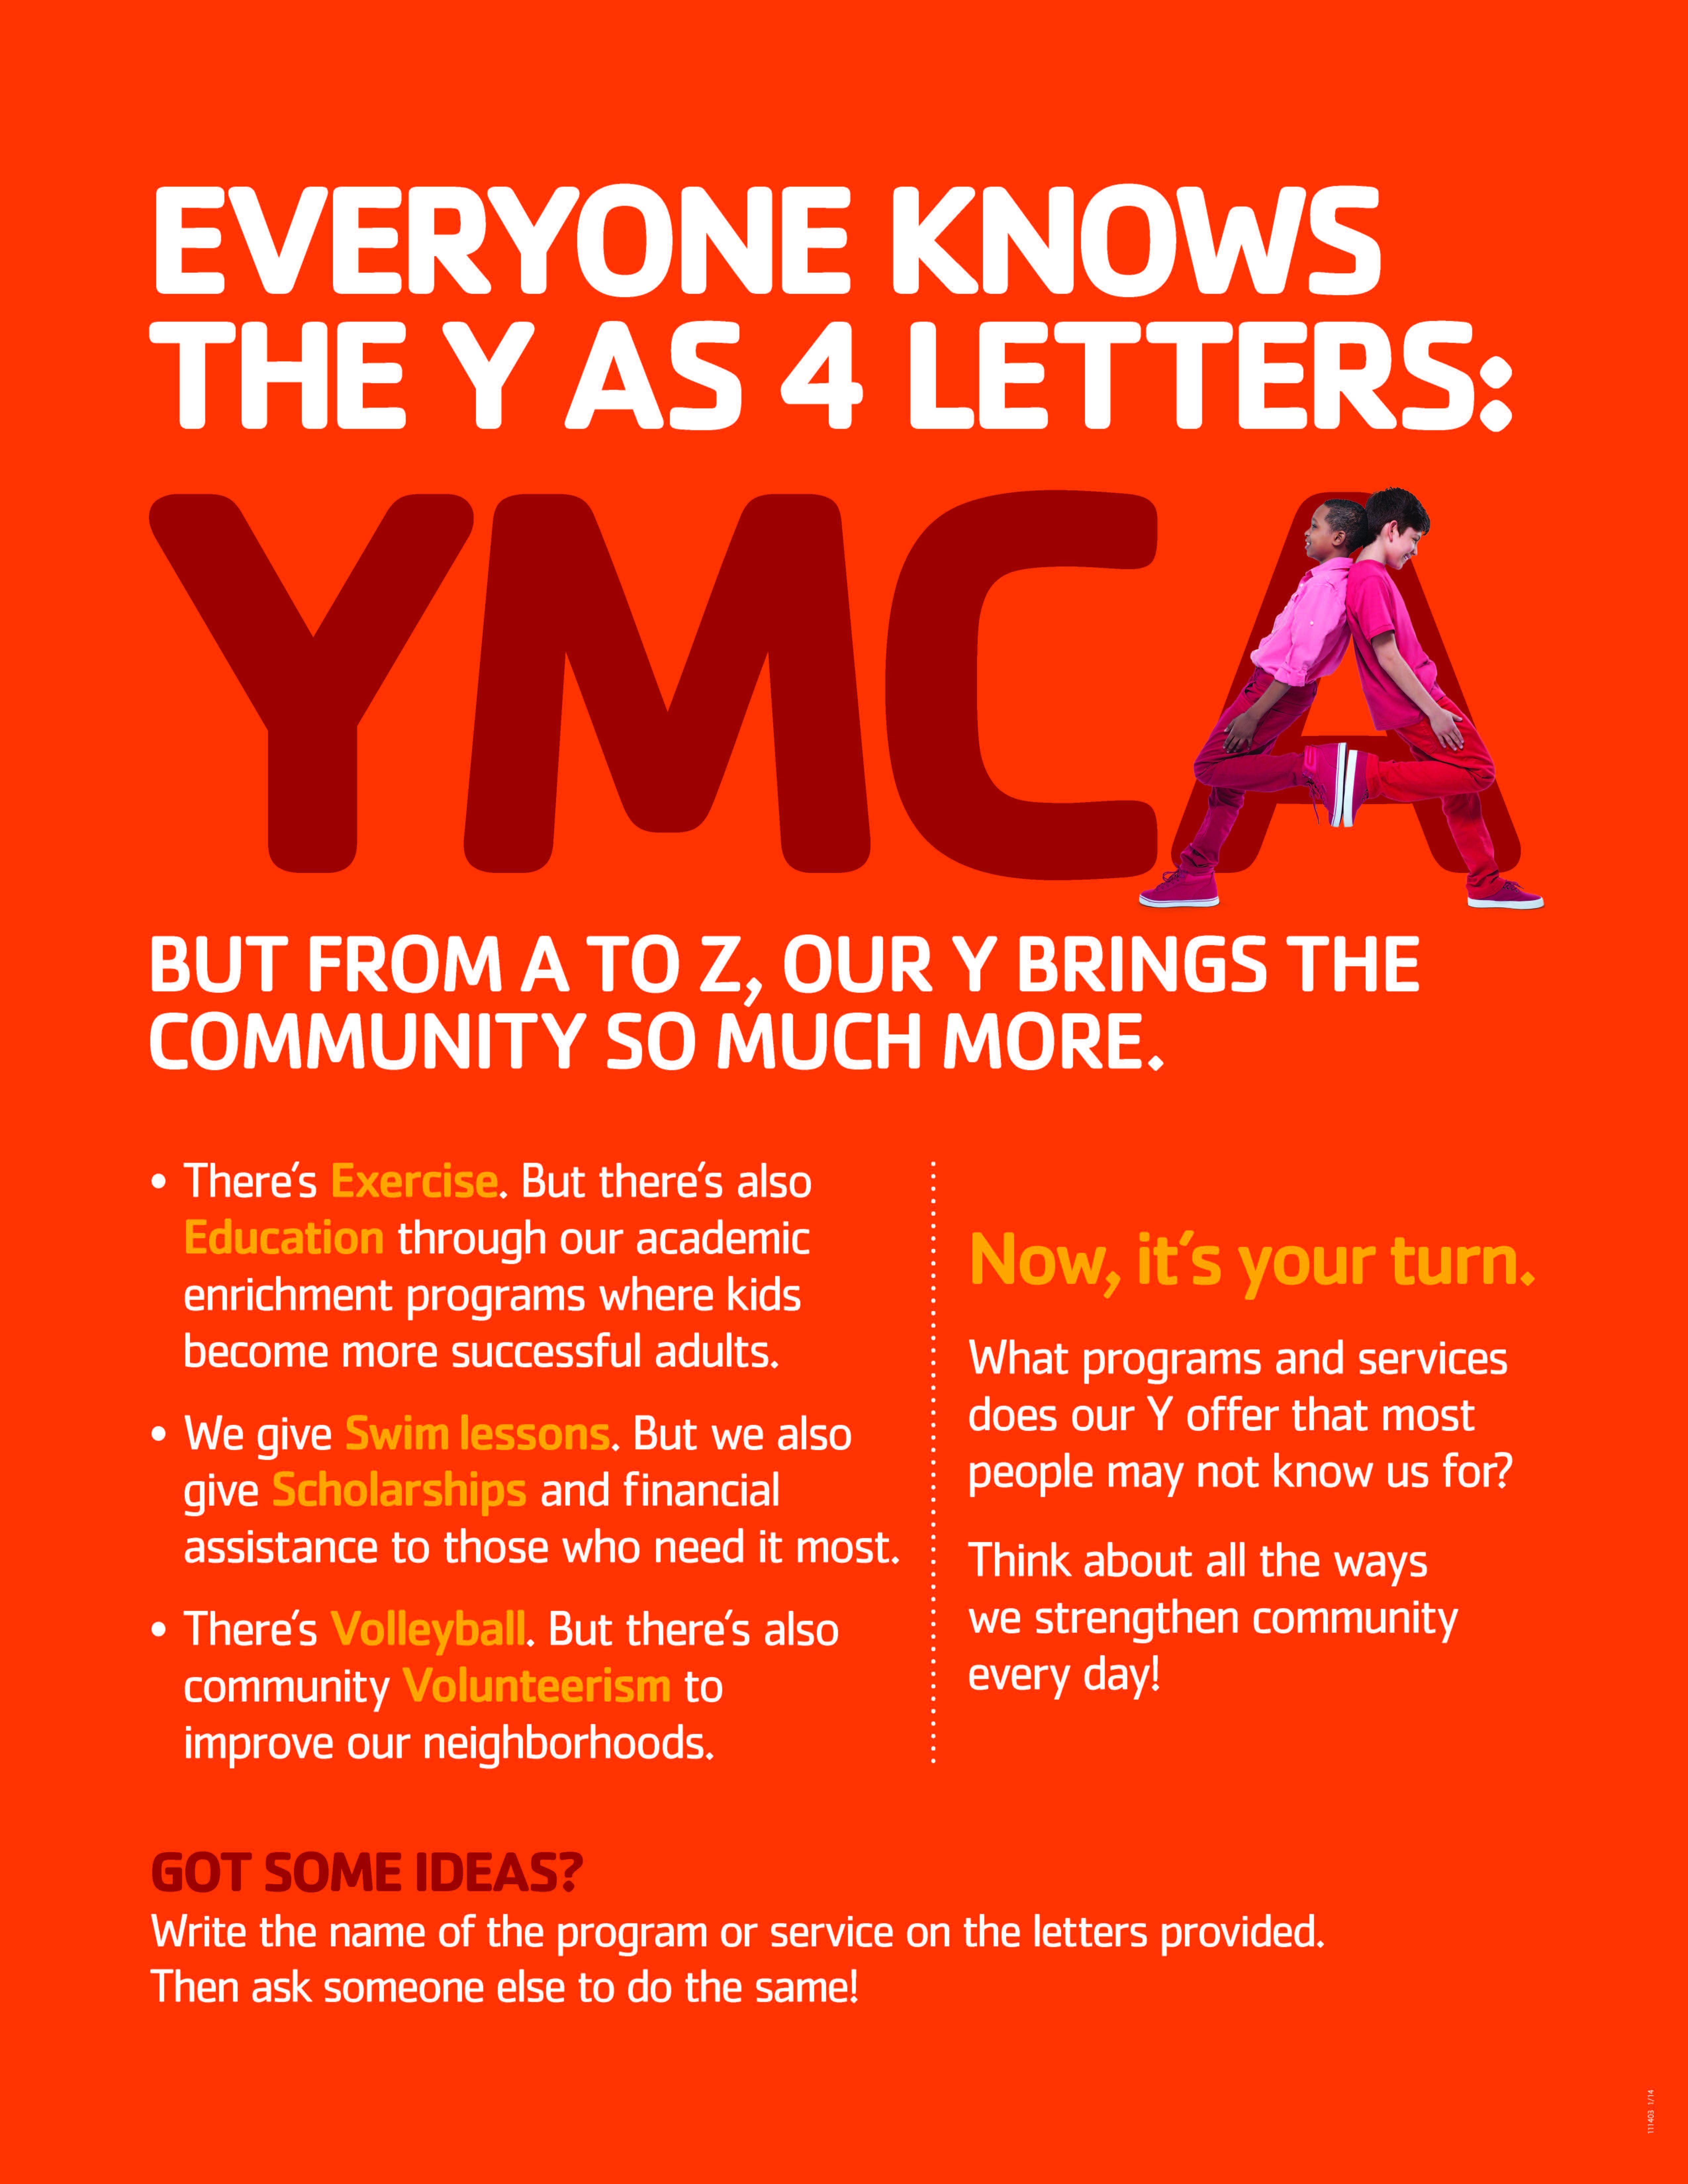 Tgfymca Ymca Annual Campaign Enrichment Programs